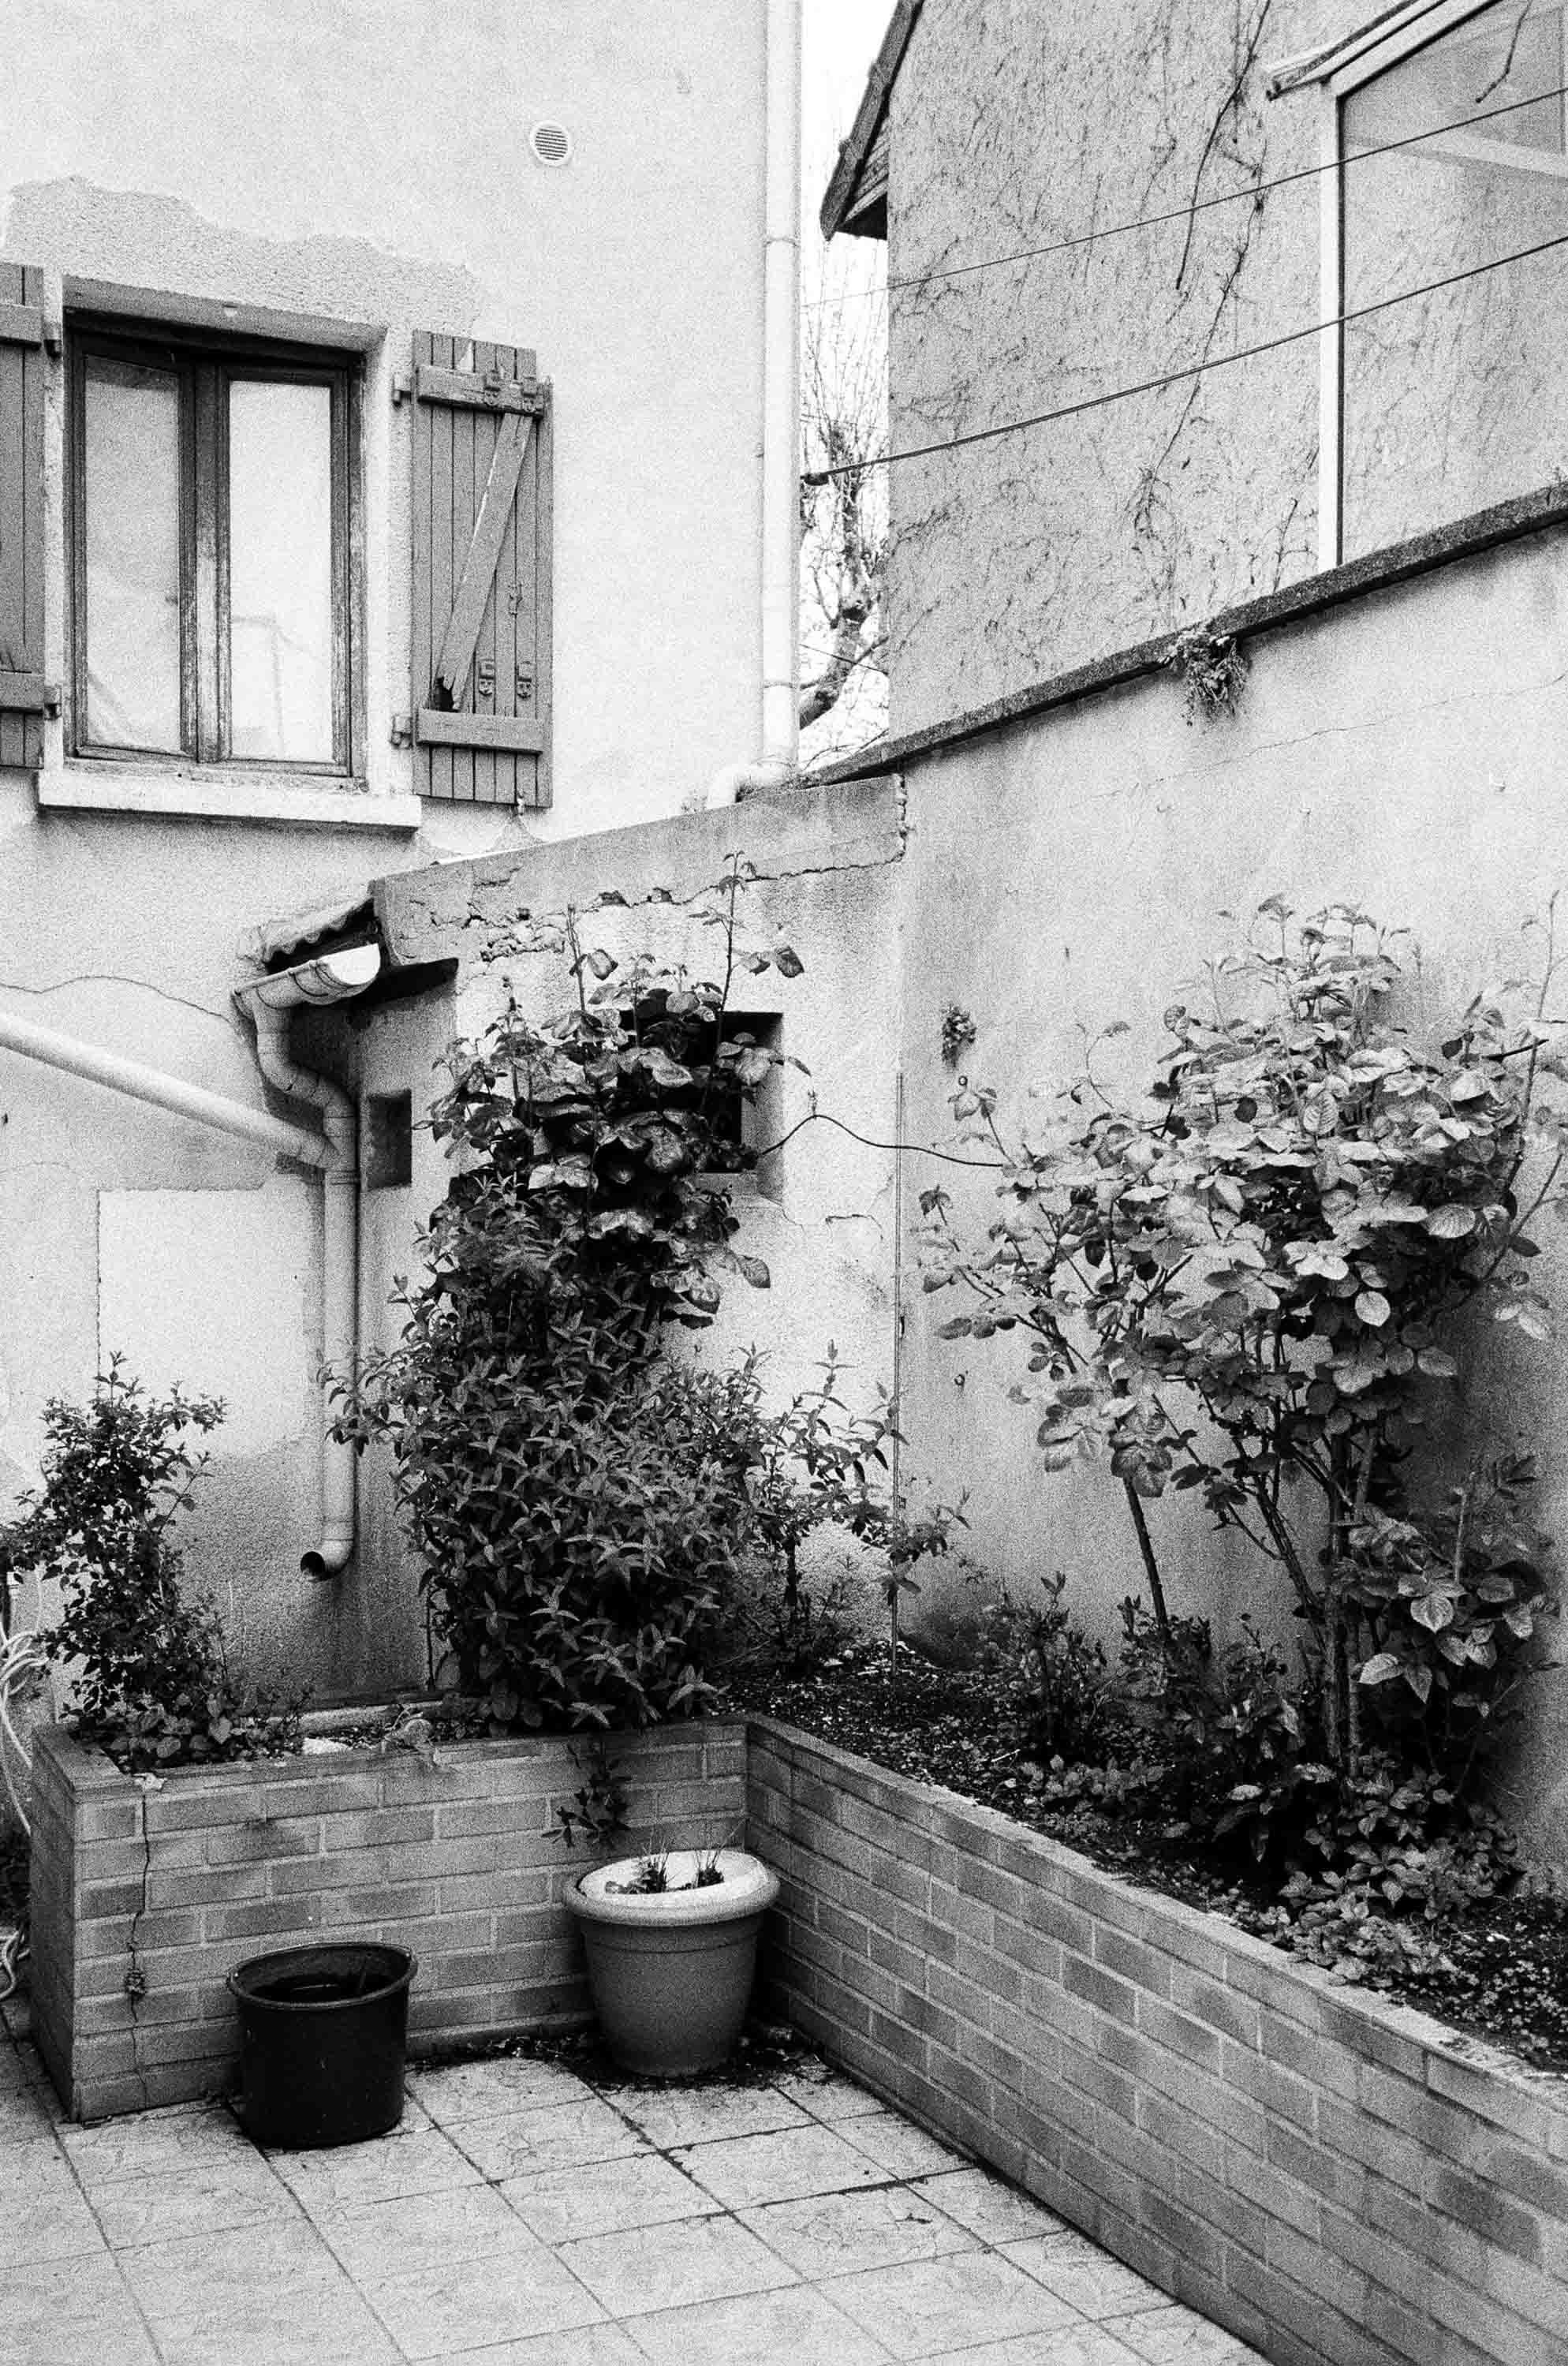 ChristosVourlis_photography_CVHAIR_CVDIARY_personal diary__film_35mm_49260007.JPG